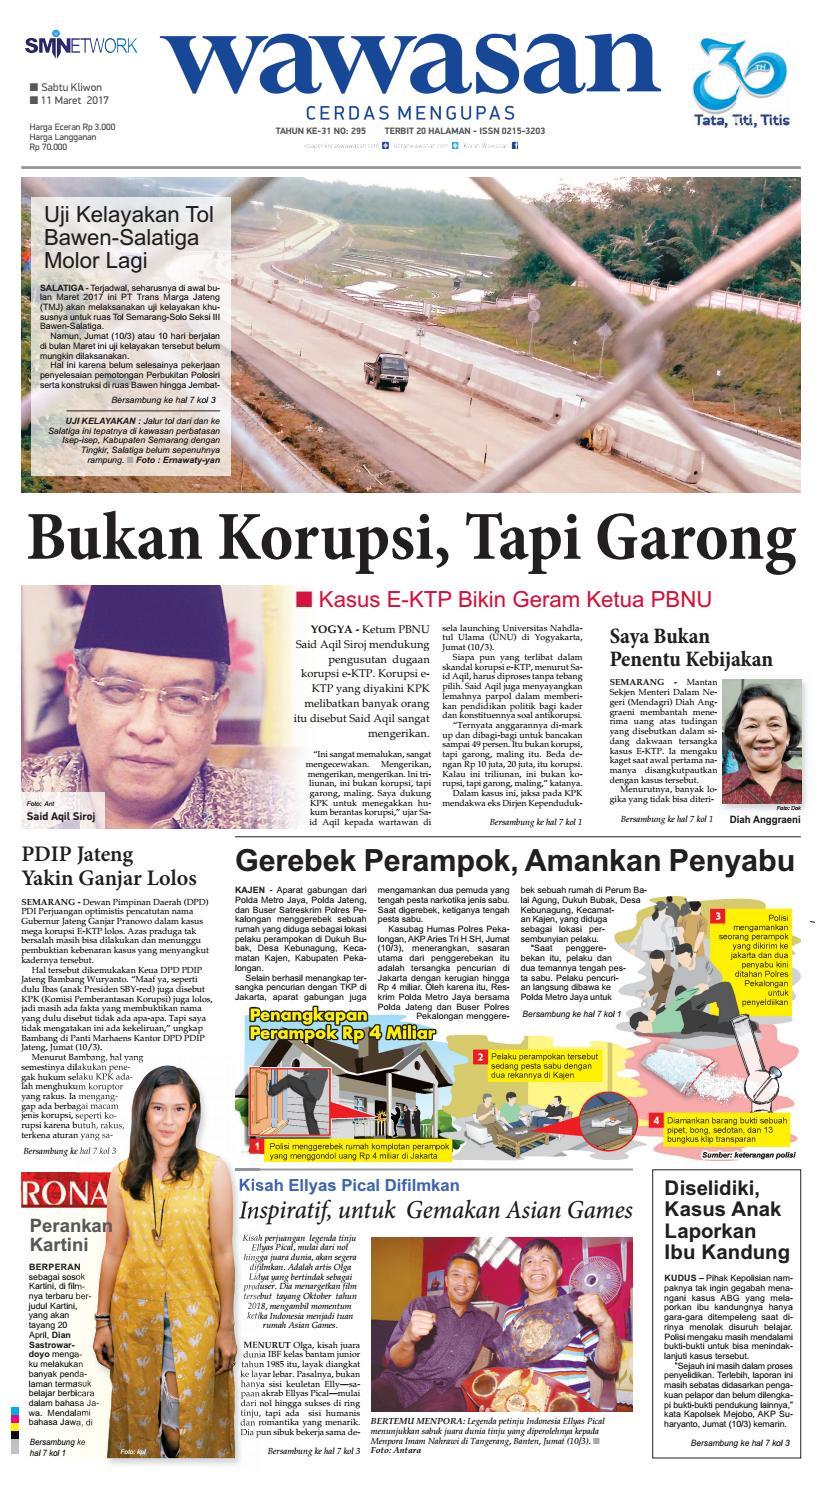 Wawasan 11 Maret 2017 By Koran Pagi Issuu Produk Ukm Bumn Kain Batik Middle Premium 3 Bendera 01